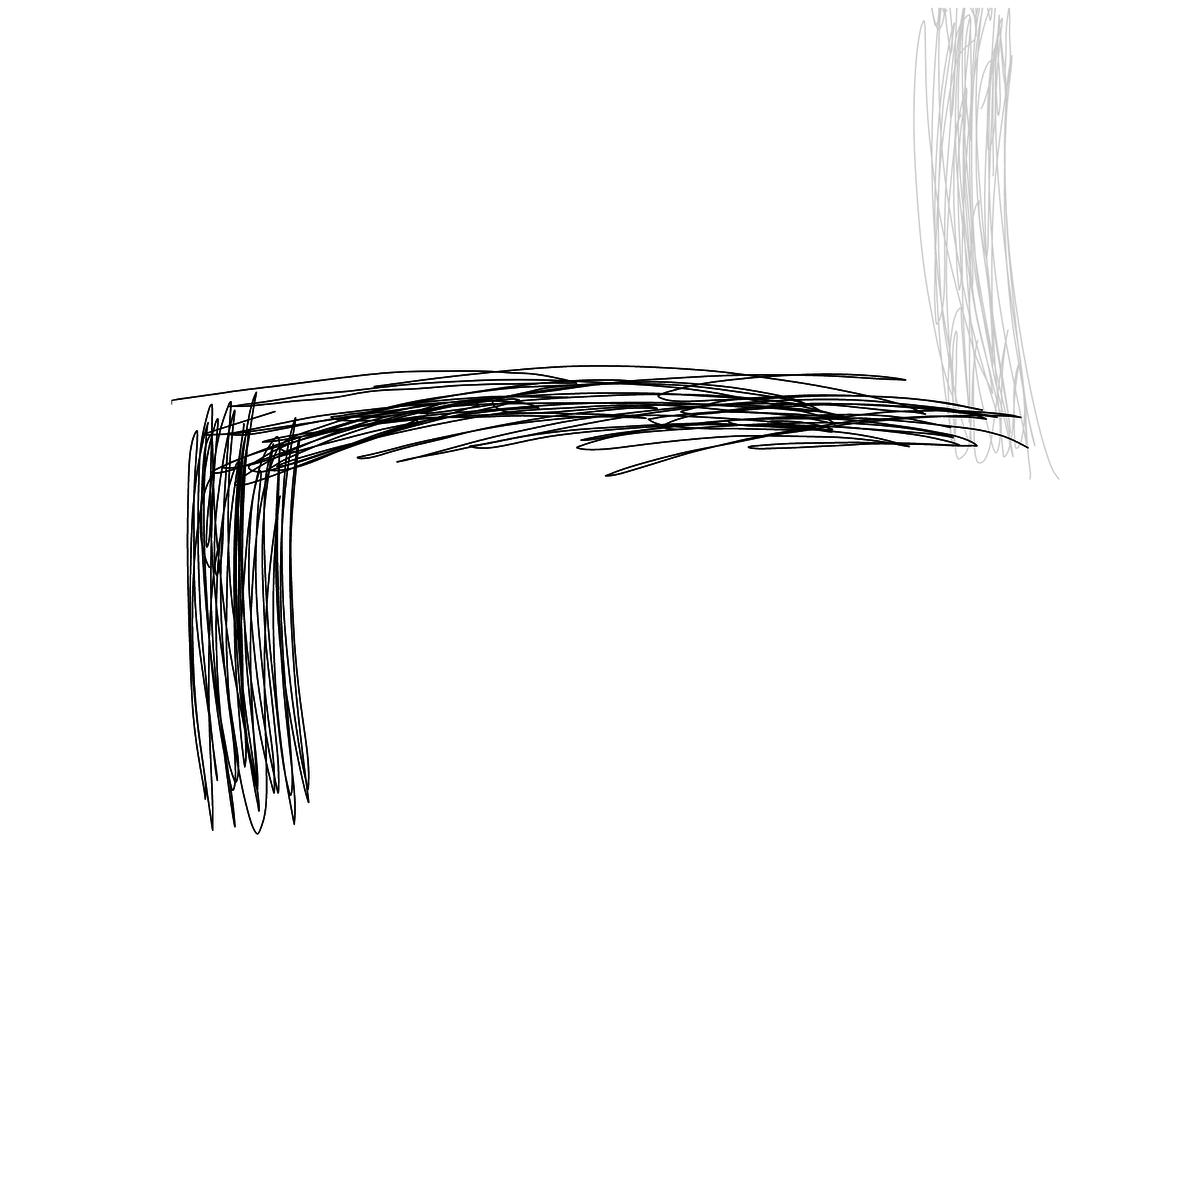 BAAAM drawing#23543 lat:65.0165023803711000lng: -158.3015594482422000